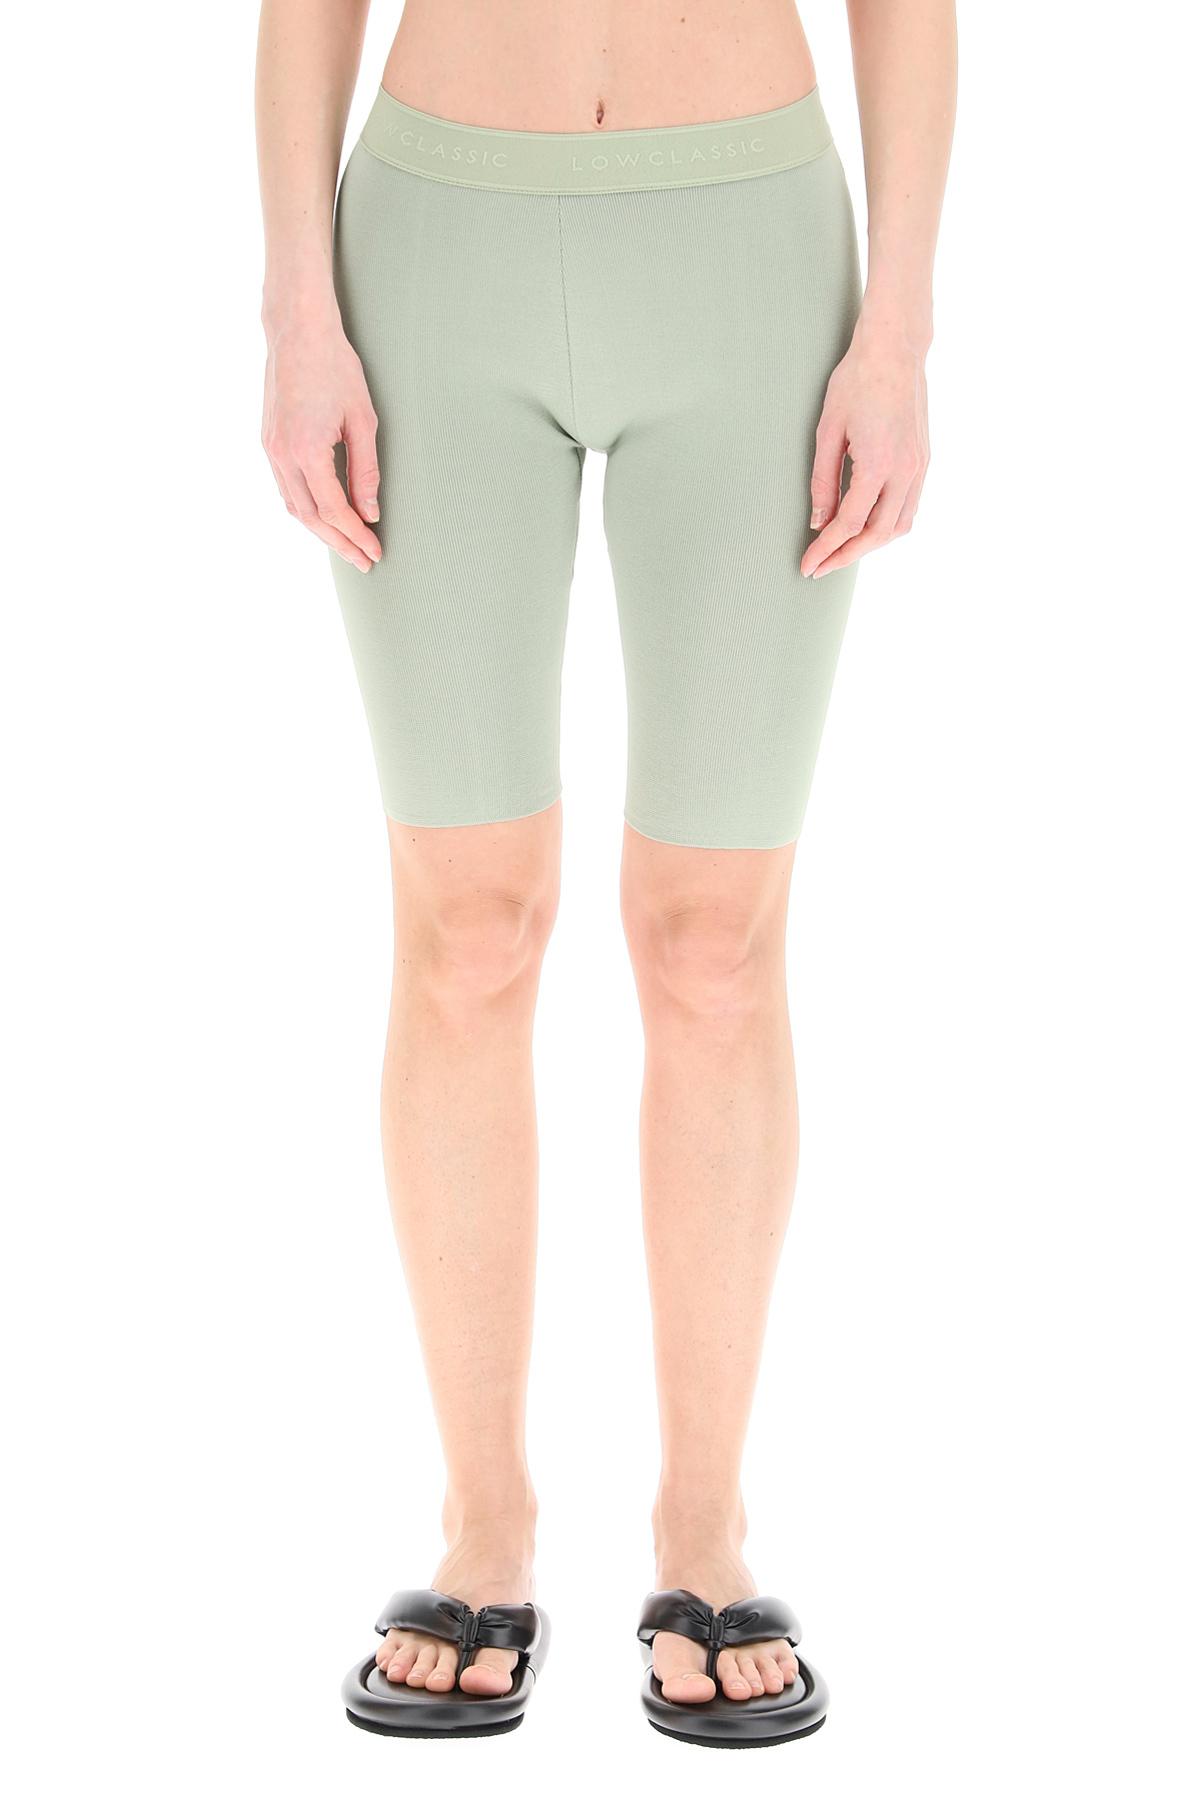 Low classic shorts aderenti in maglia